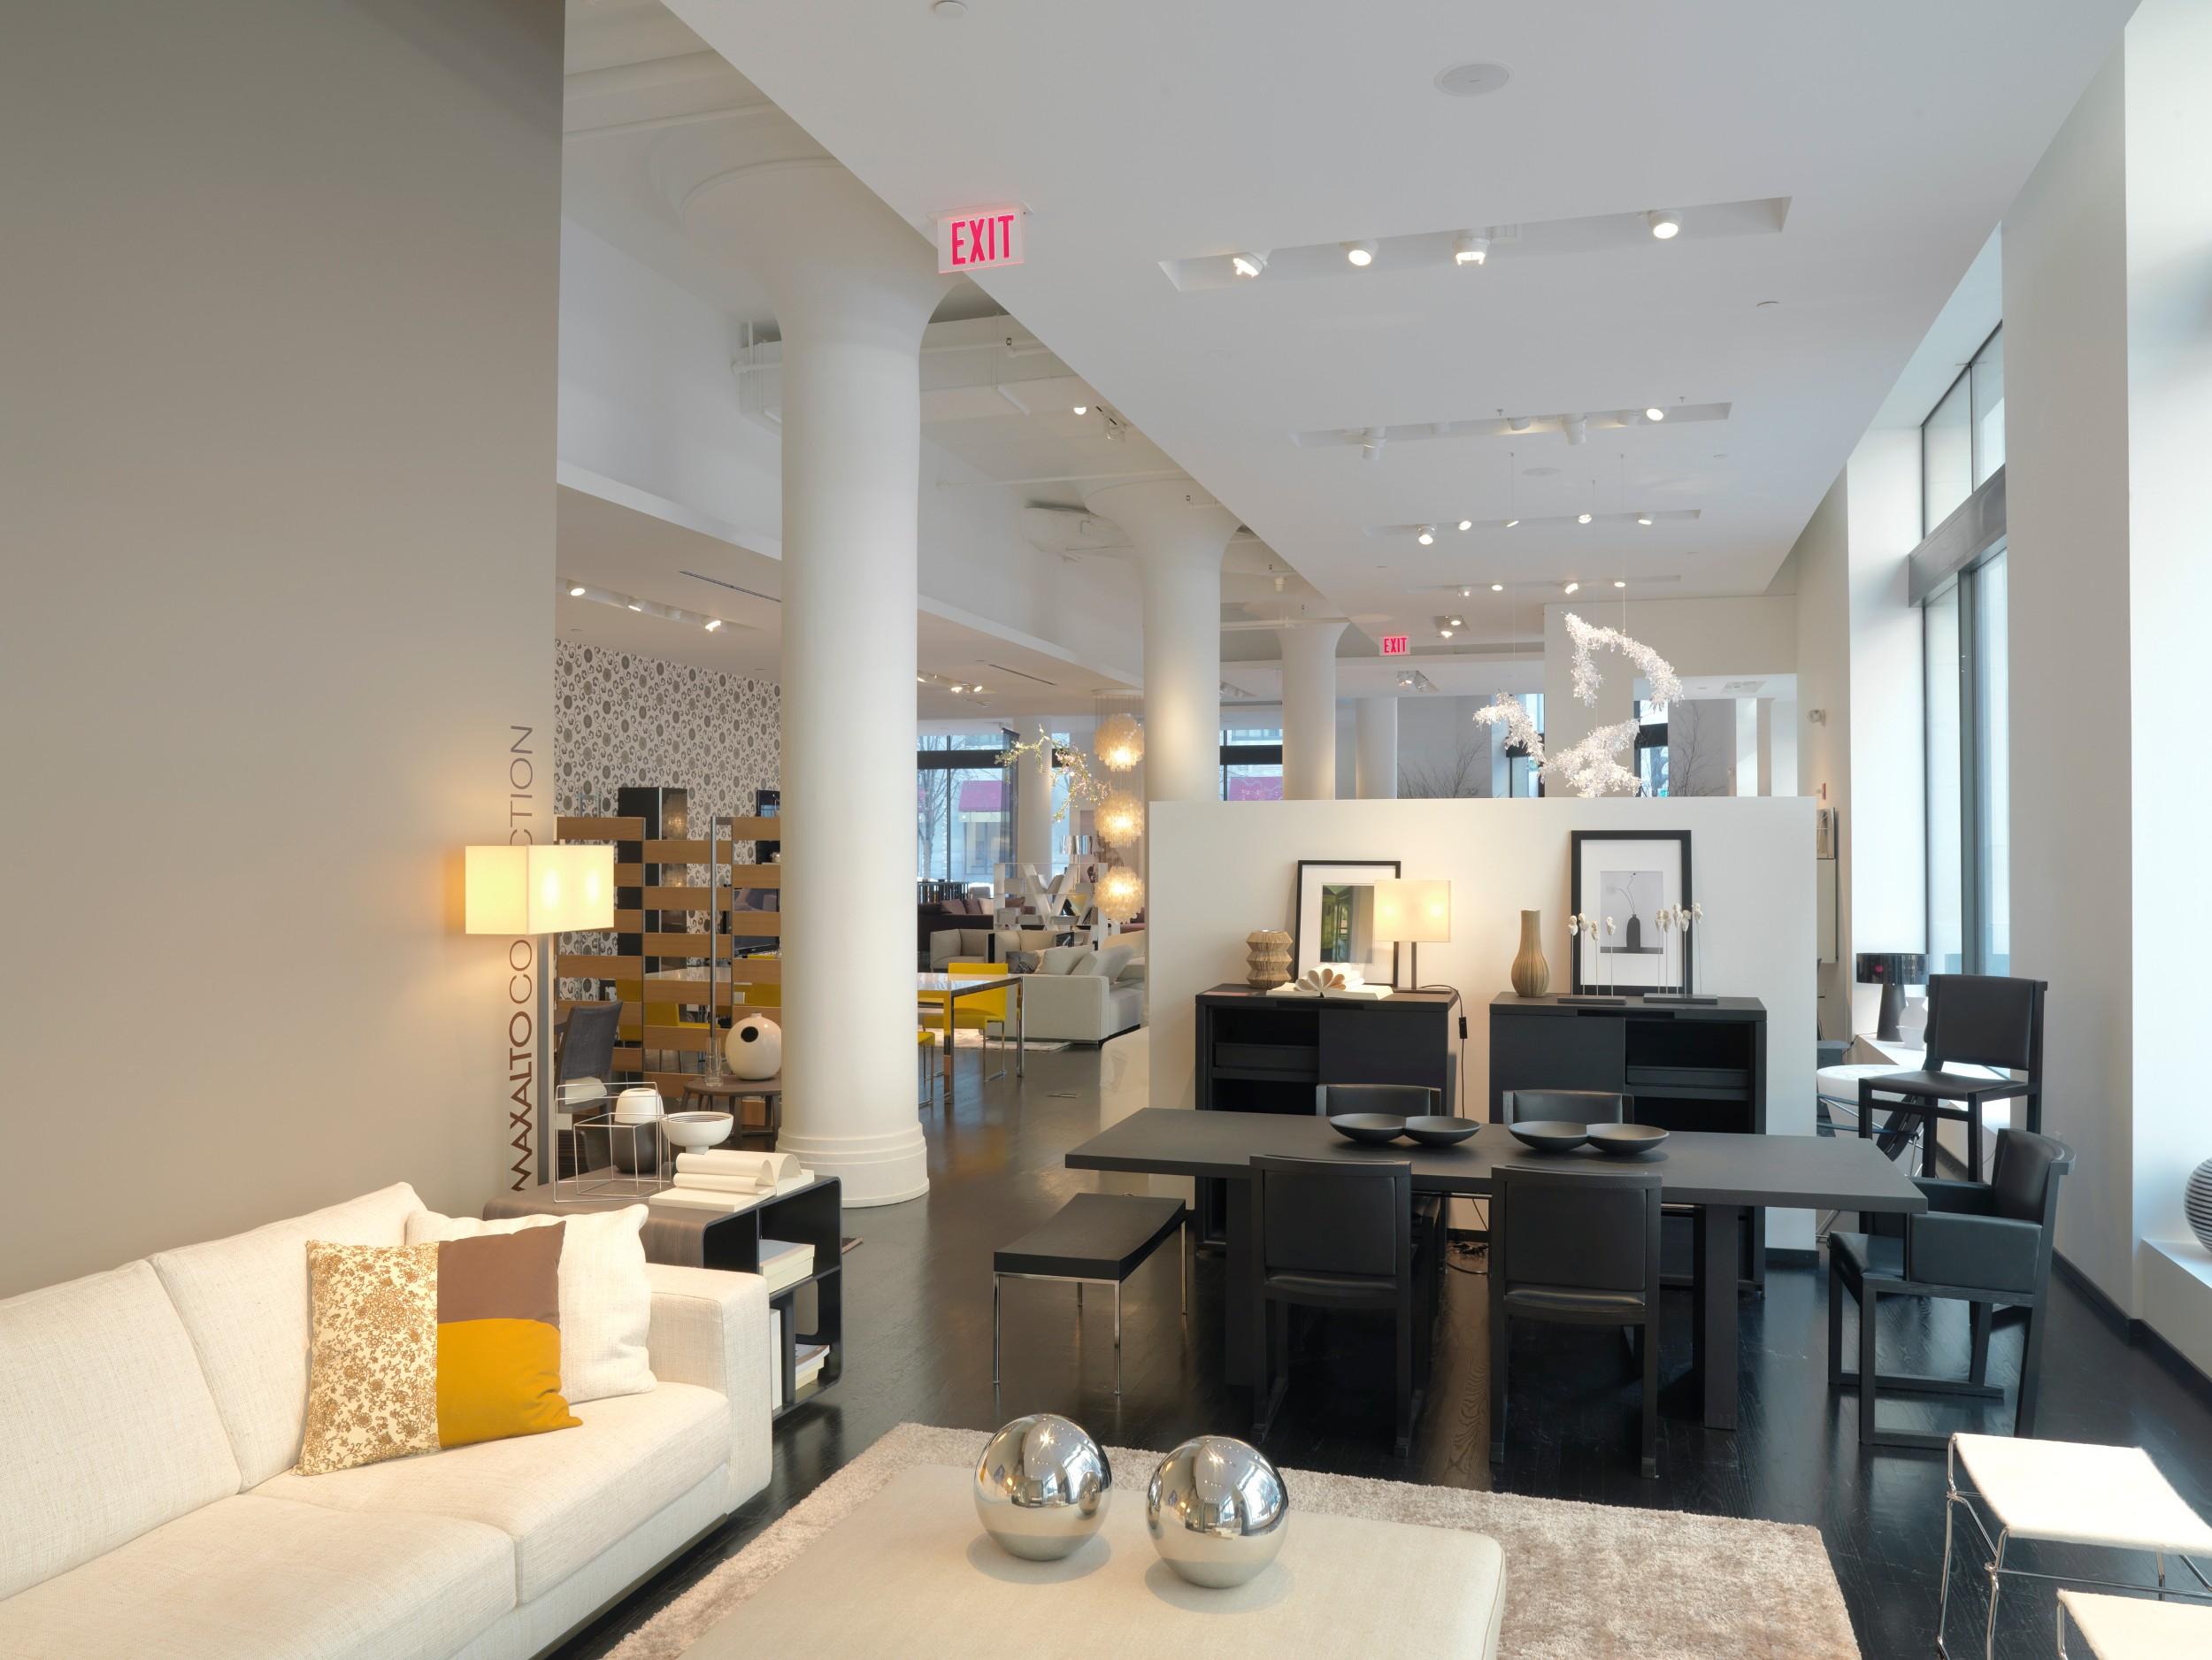 Montage_Corderman_Construction_Showroom_Boston_Open_Area.jpg